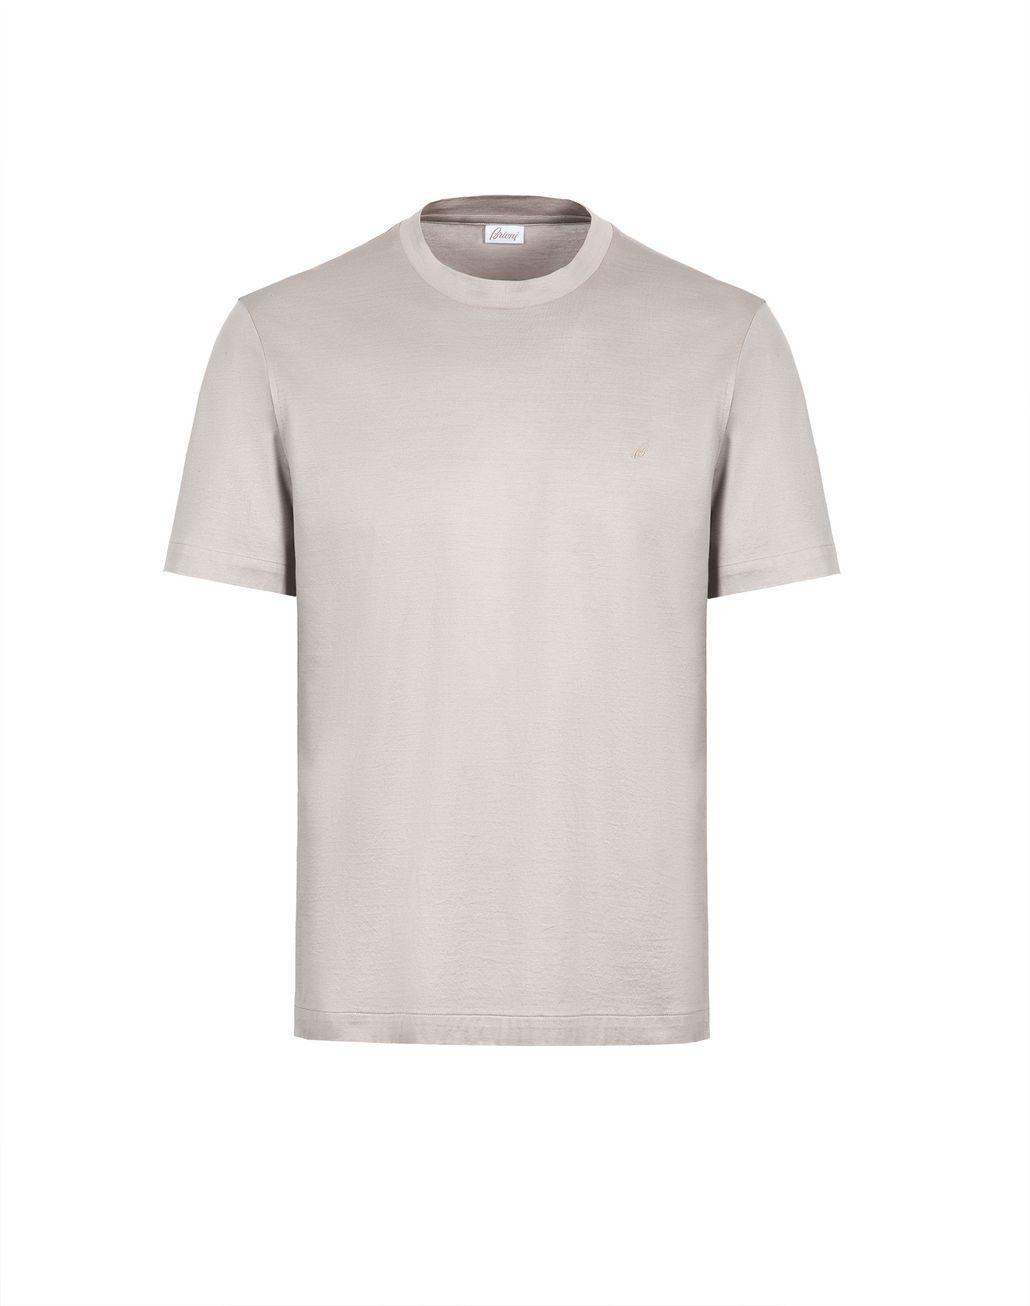 BRIONI Beige Logoed T-Shirt T-Shirts & Polos Man f